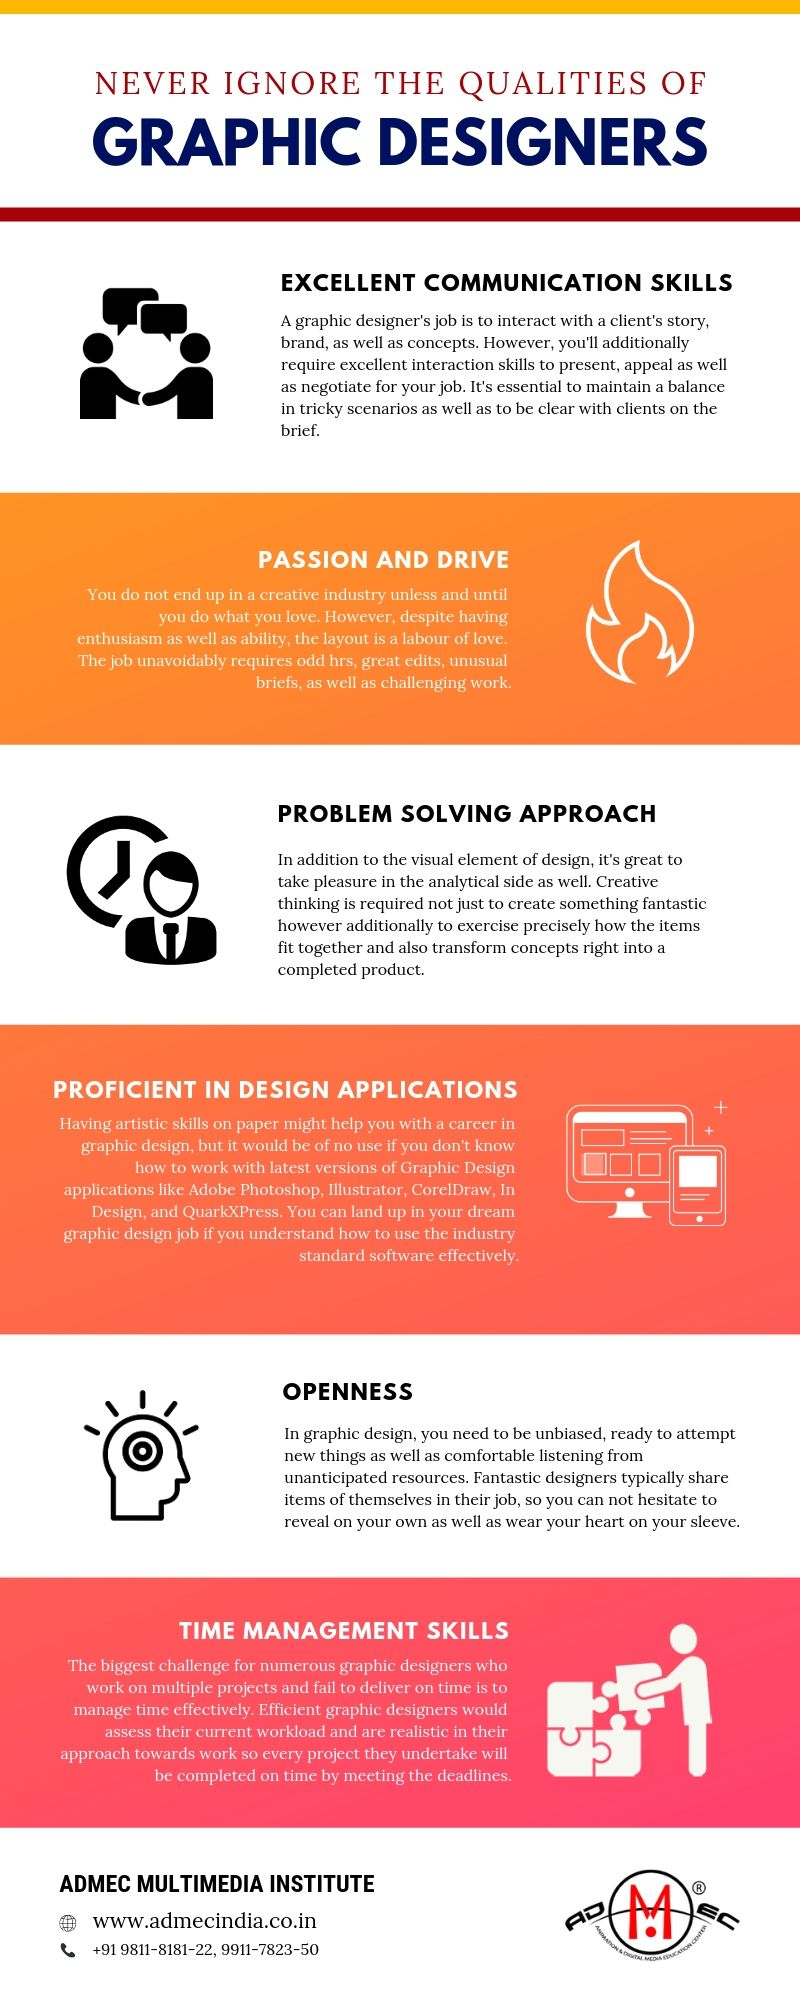 Never Ignore The Qualities Of Graphic Designers Professional Graphic Design Time Management Skills Graphic Design